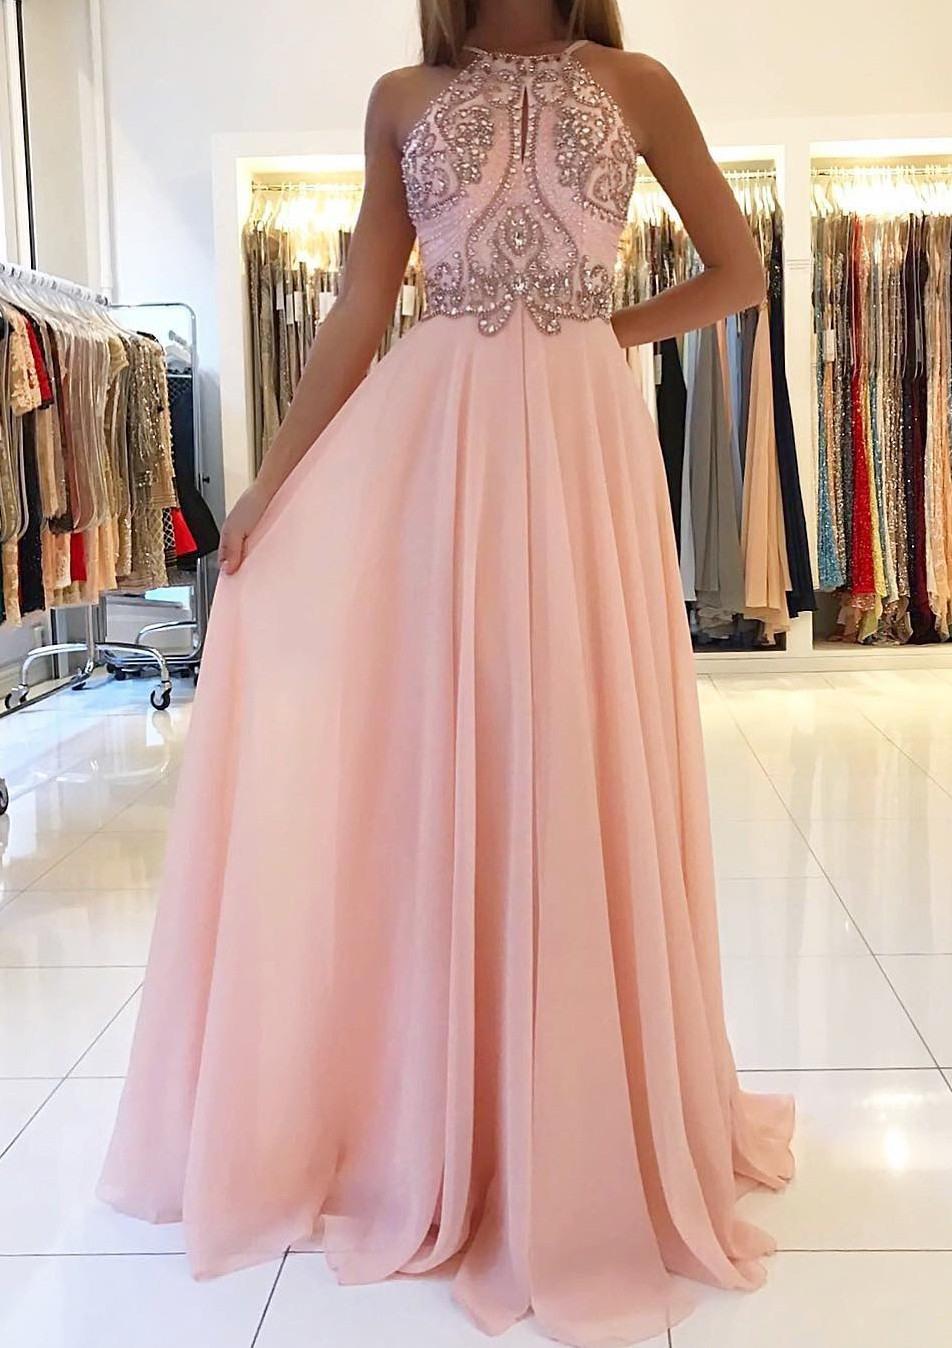 20 Spektakulär Abend Kleid Rosa ÄrmelFormal Elegant Abend Kleid Rosa Galerie